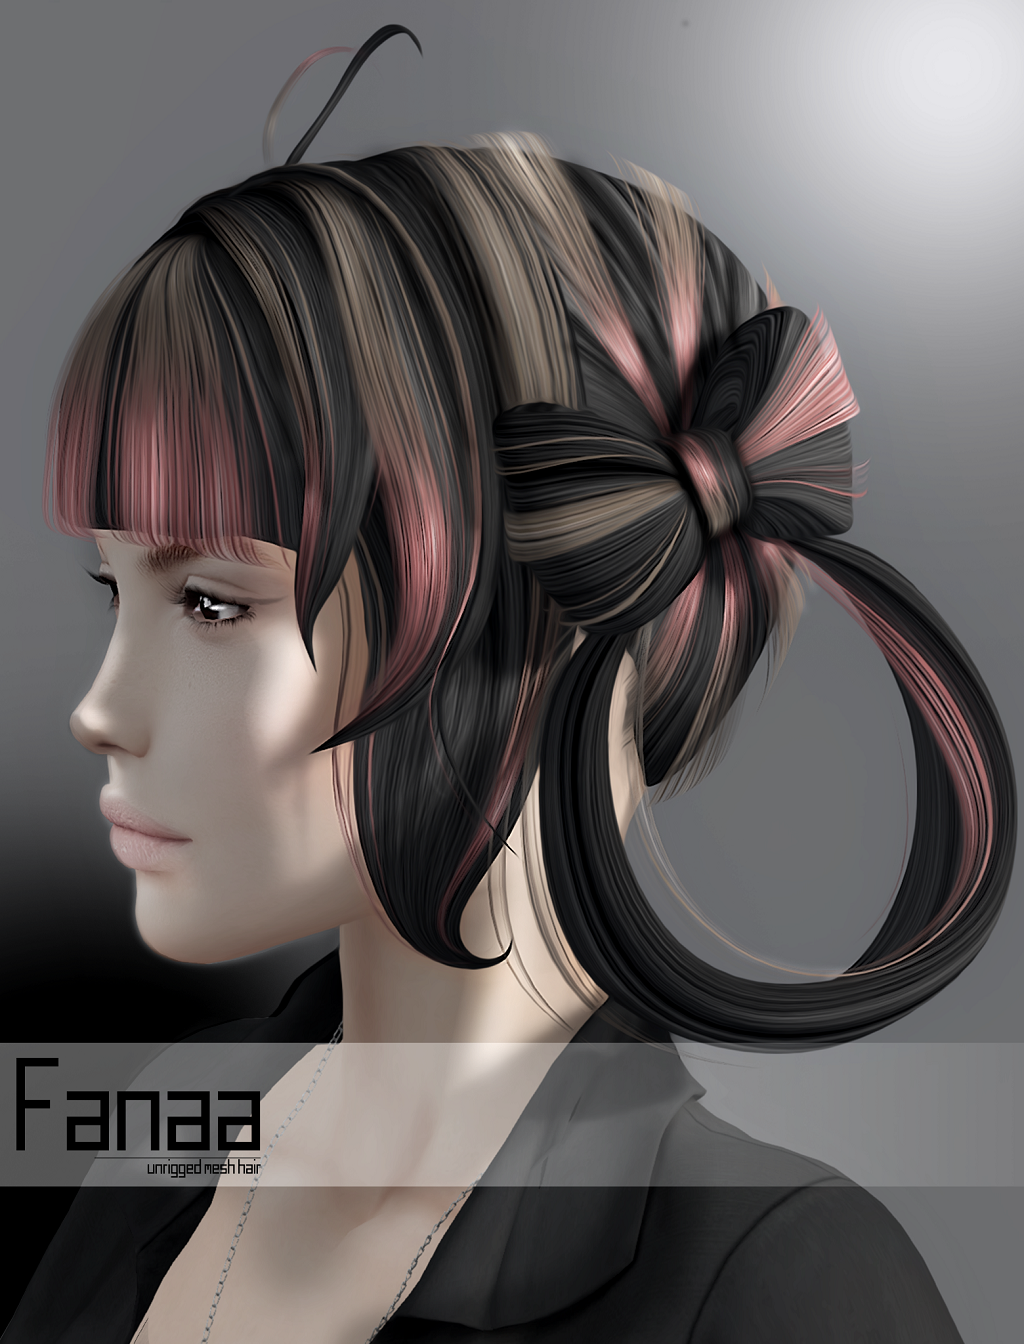 Fanaa_ADpng.png